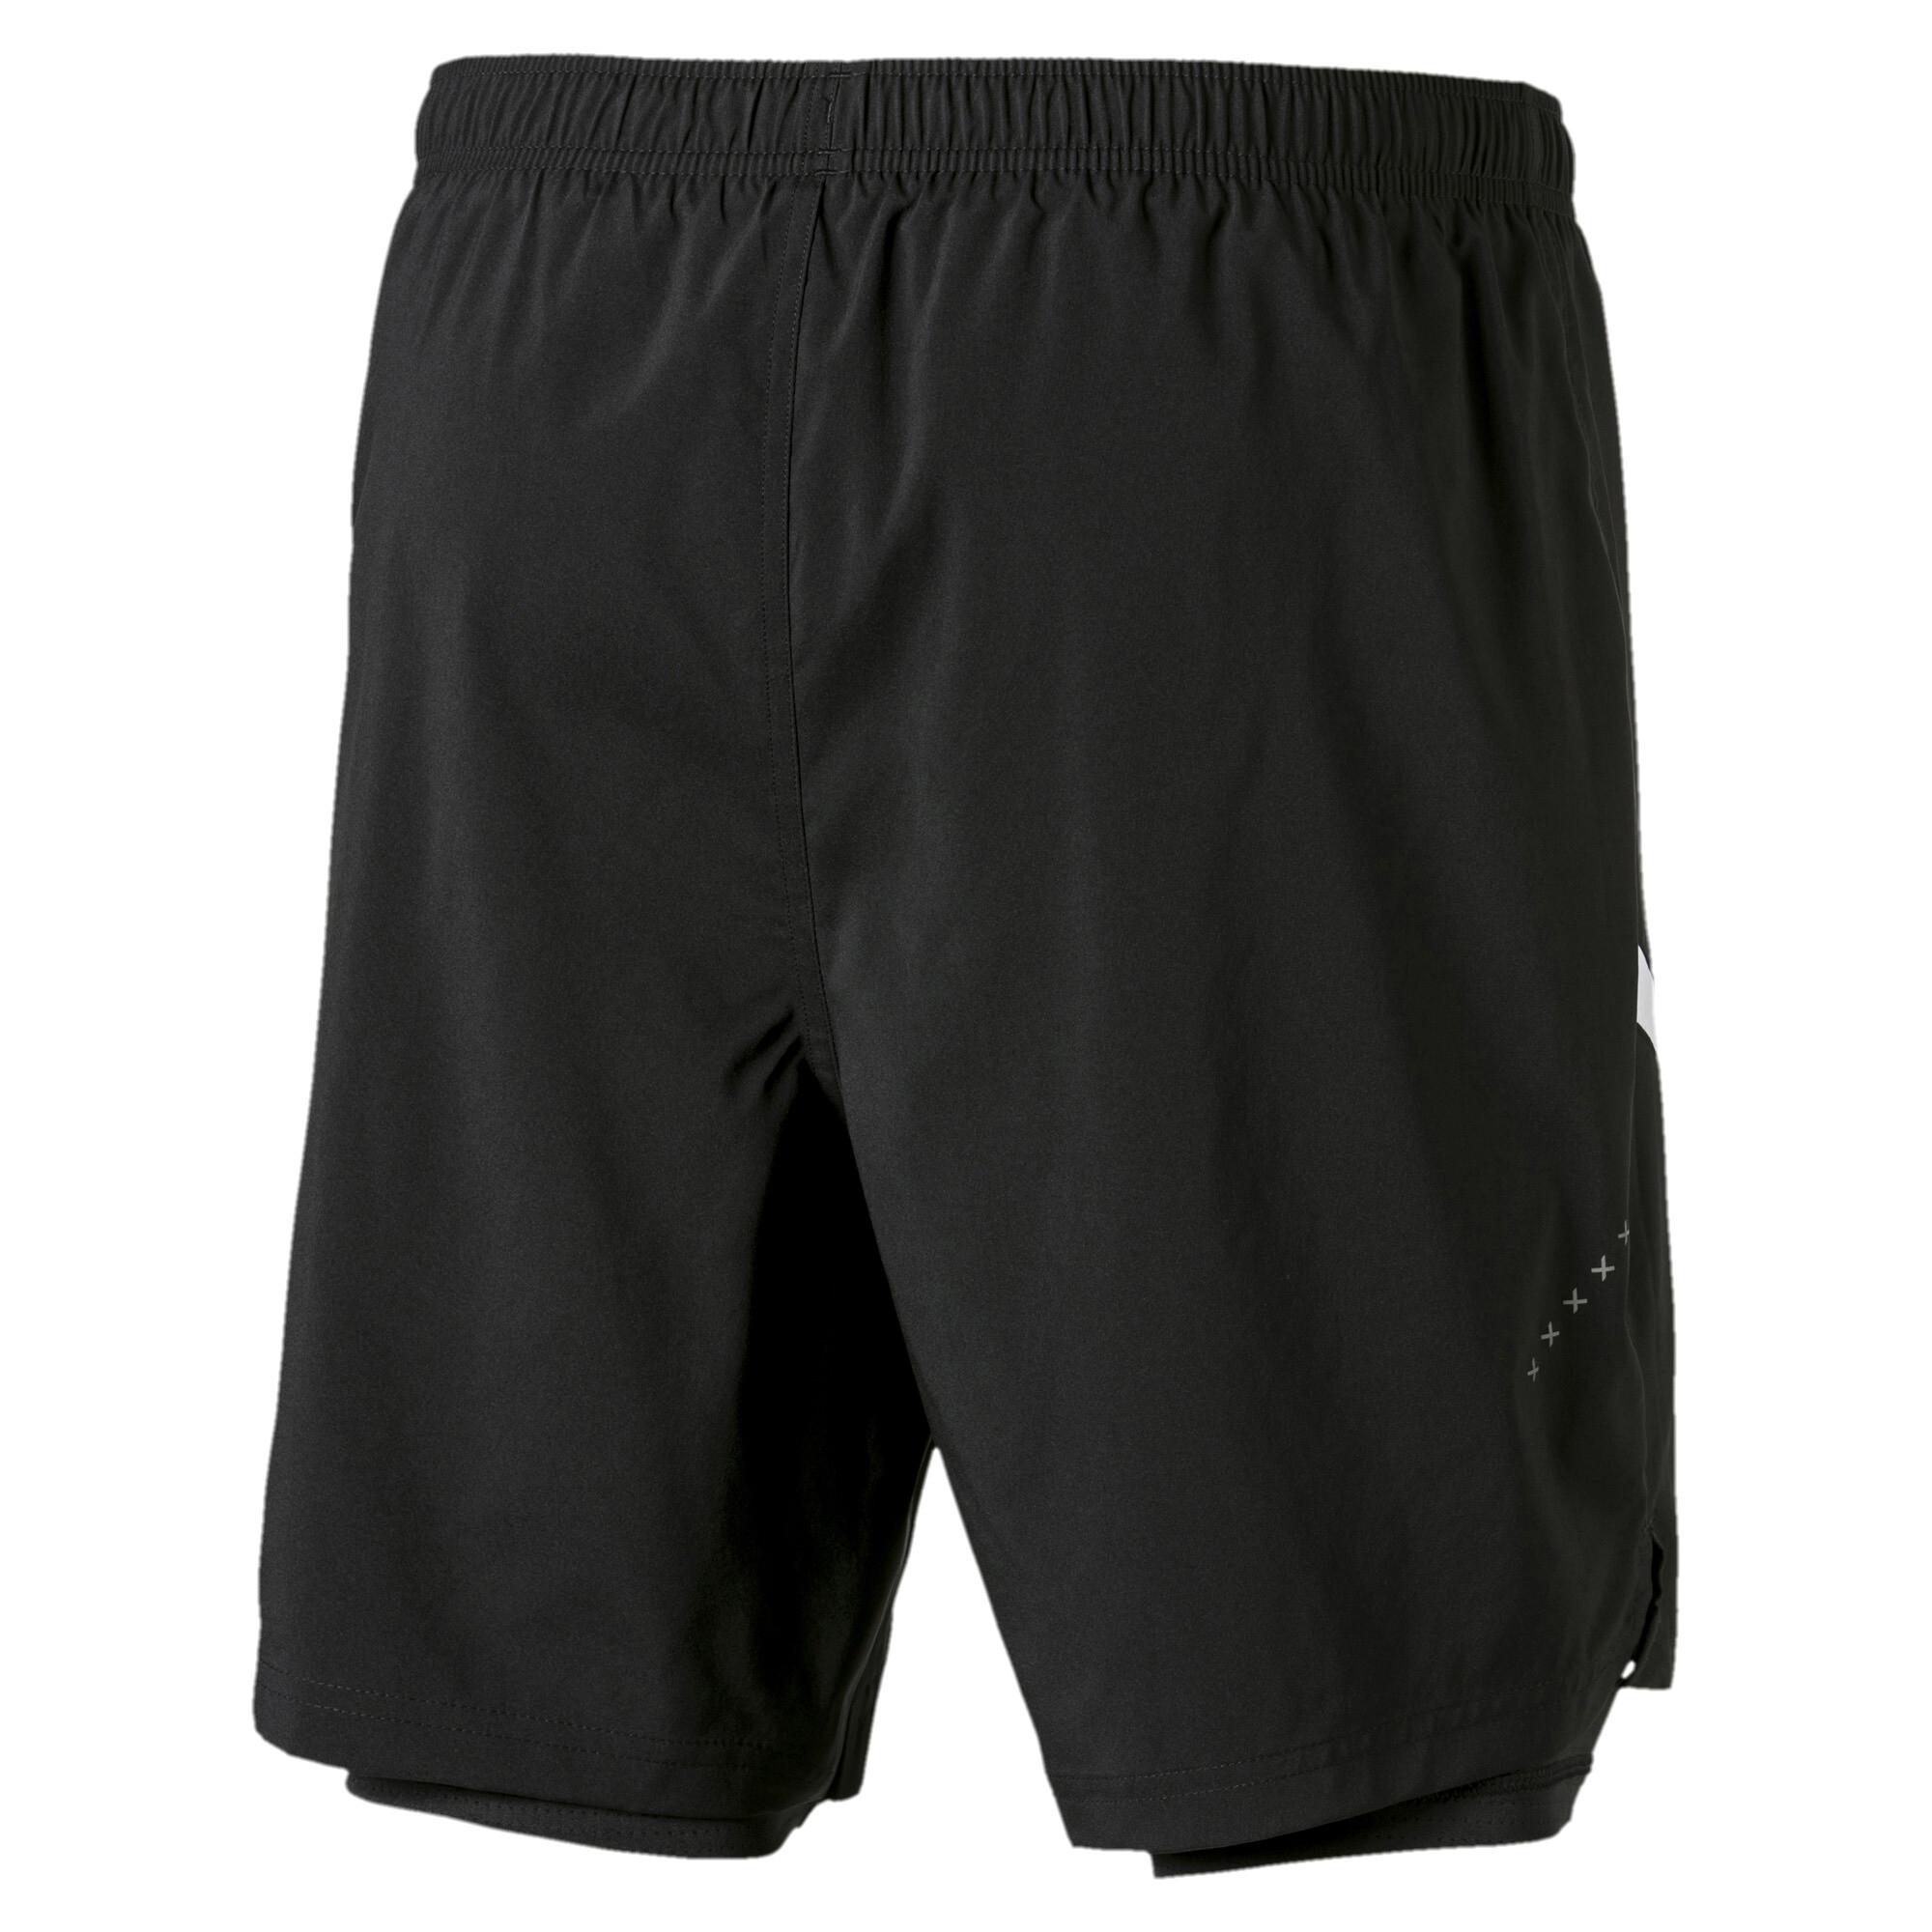 Image Puma Ignite Woven 2 in 1 Men's Running Shorts #6